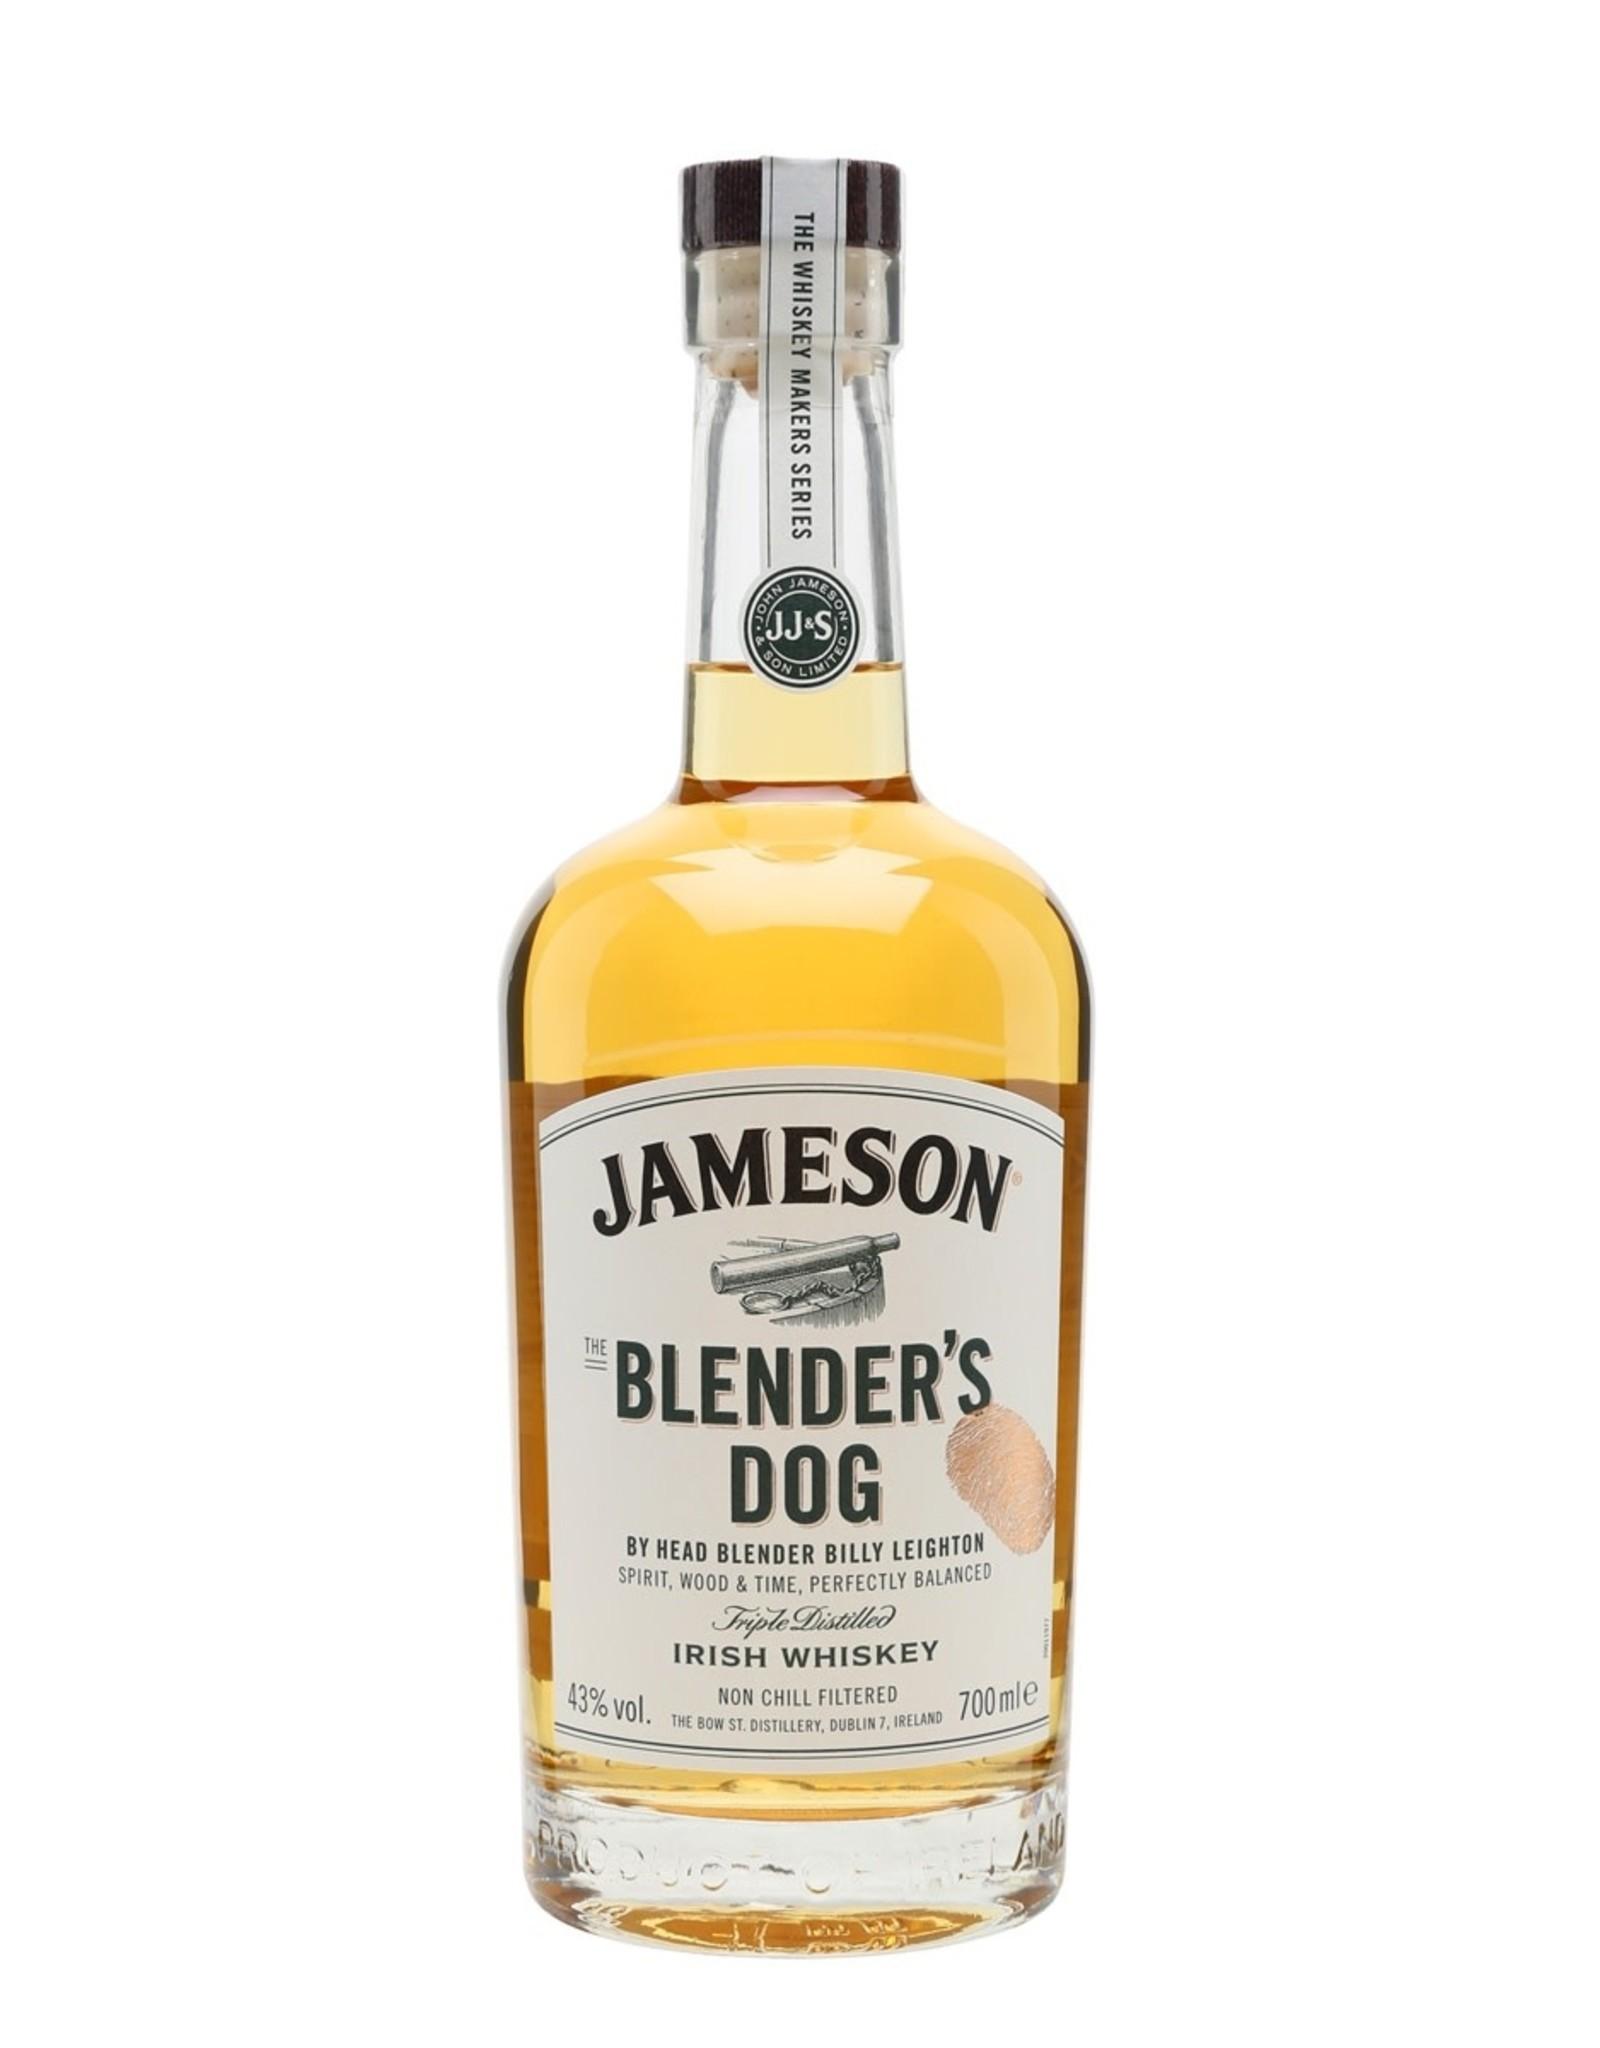 JAMESON BLENDER'S DOG LIMITED EDITION 750ML